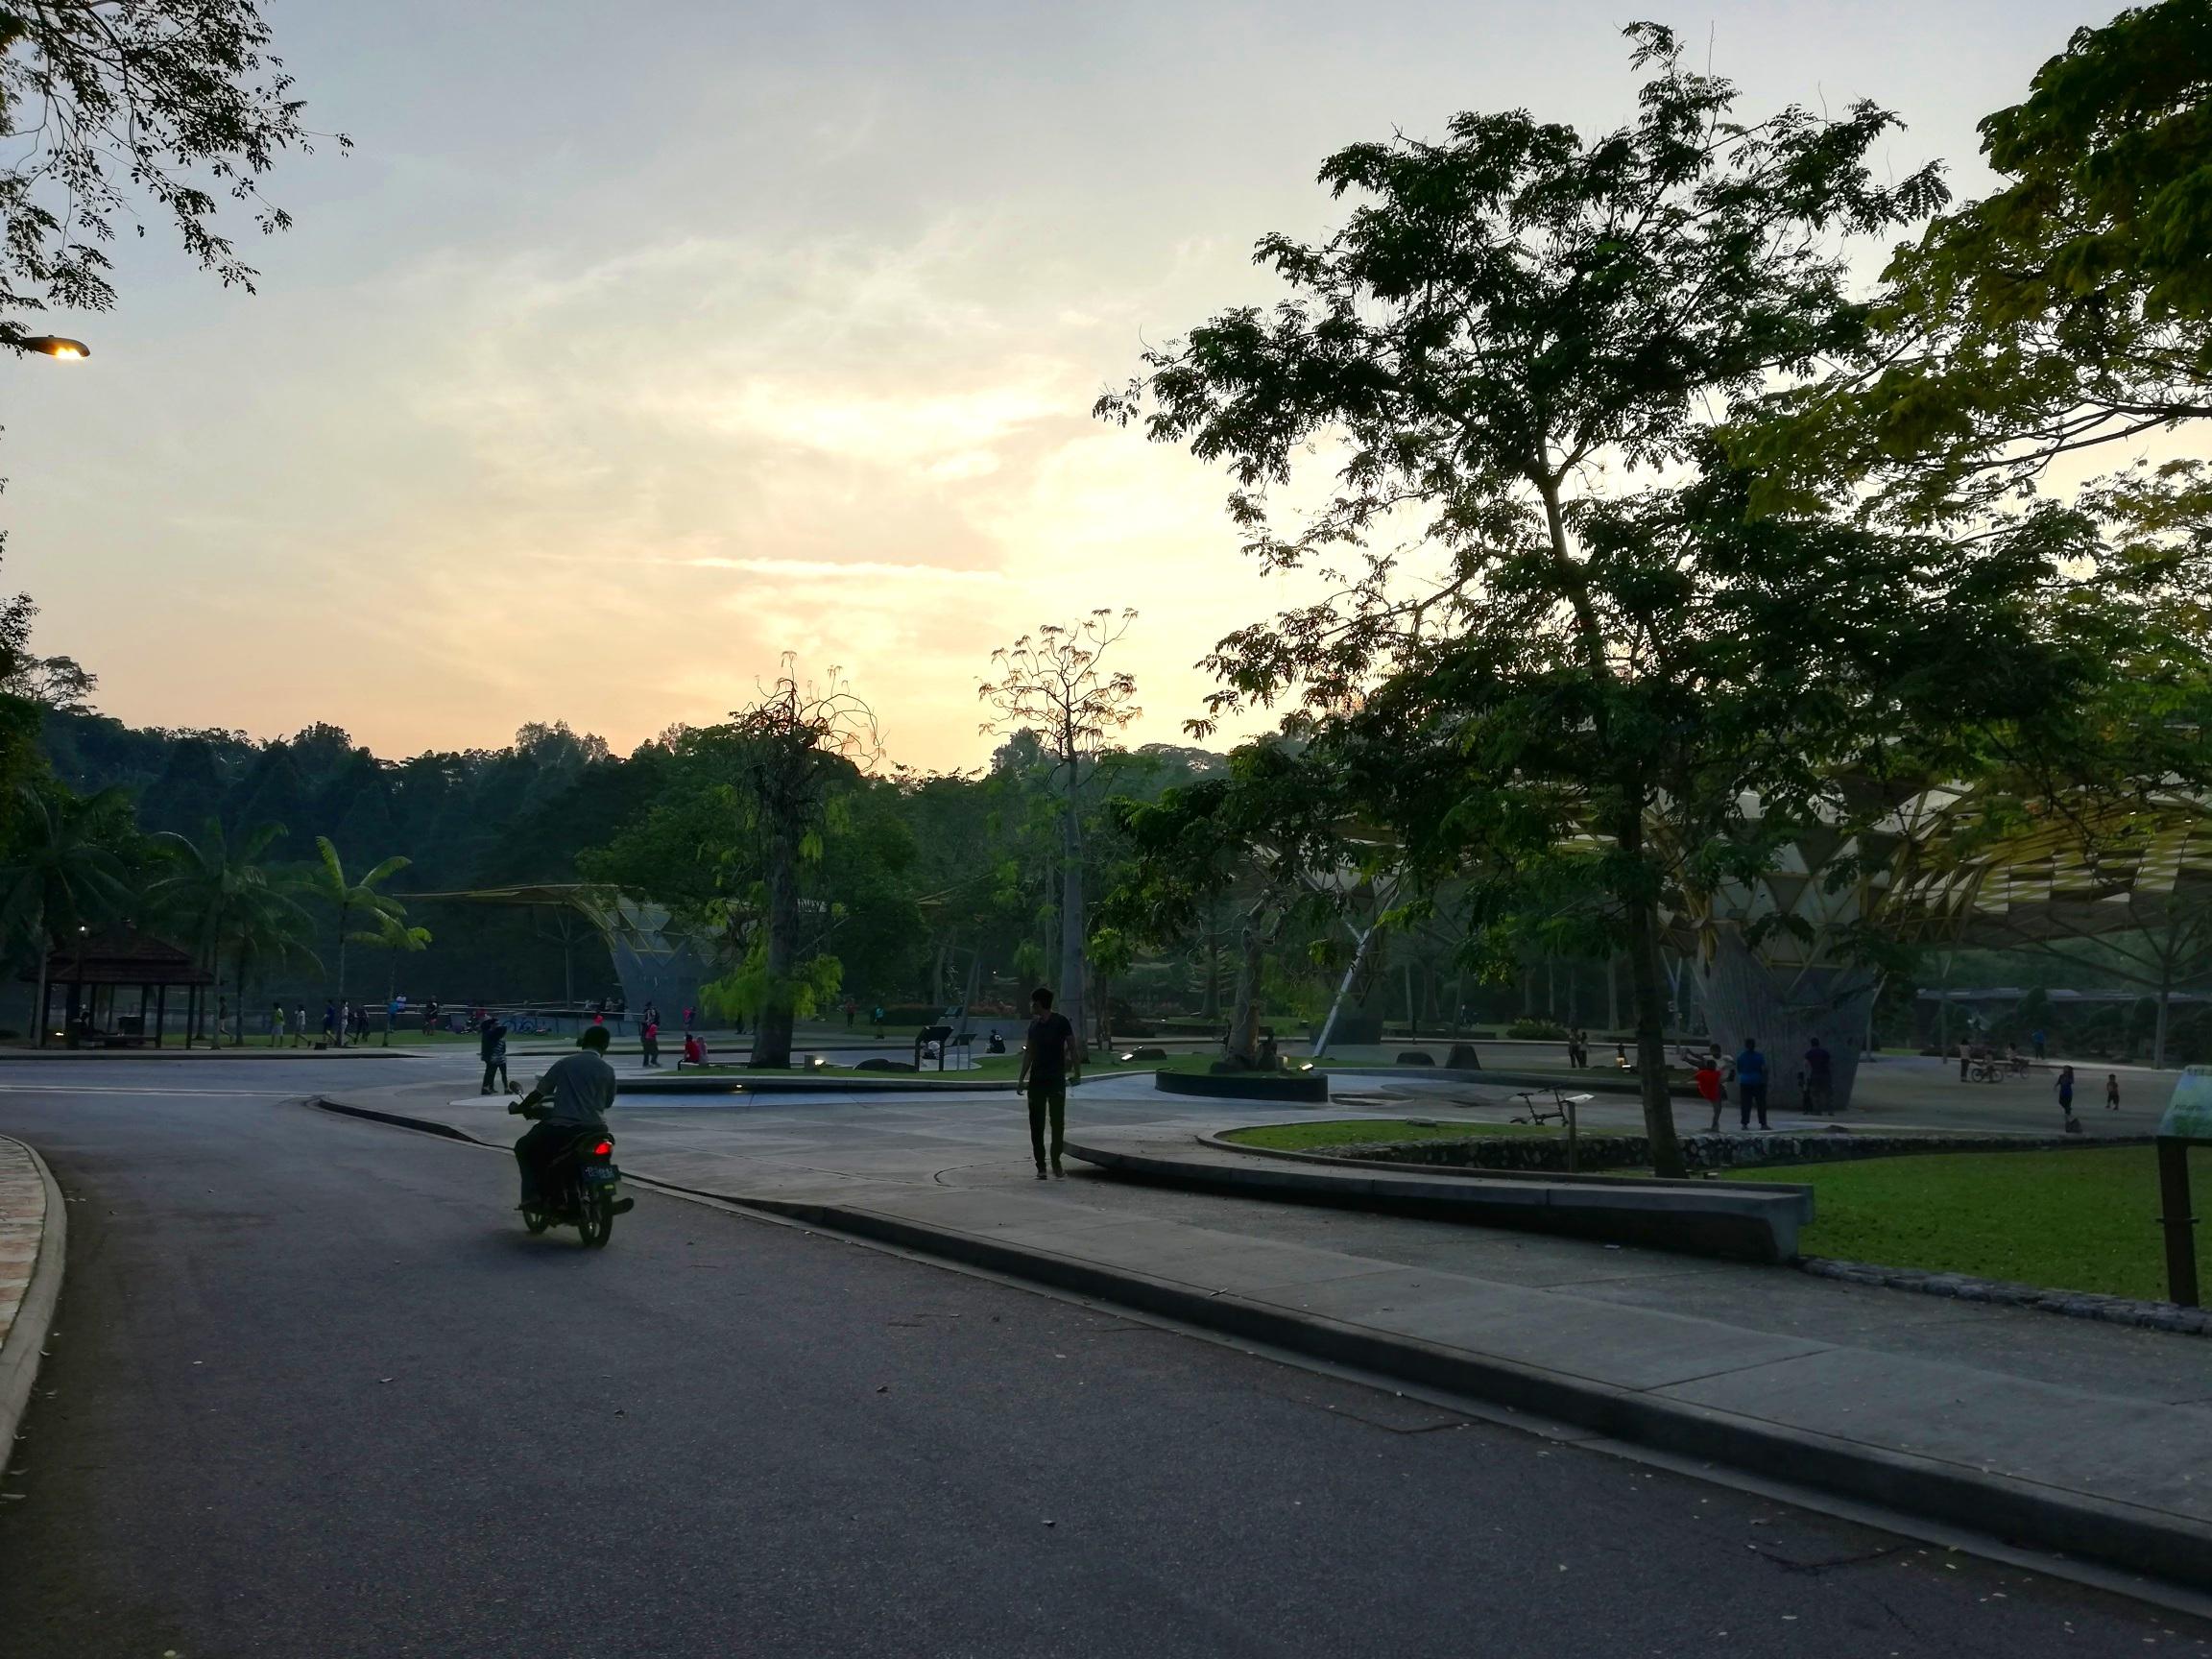 Lake-Gardens-Malaysia-Itinerary.jpg